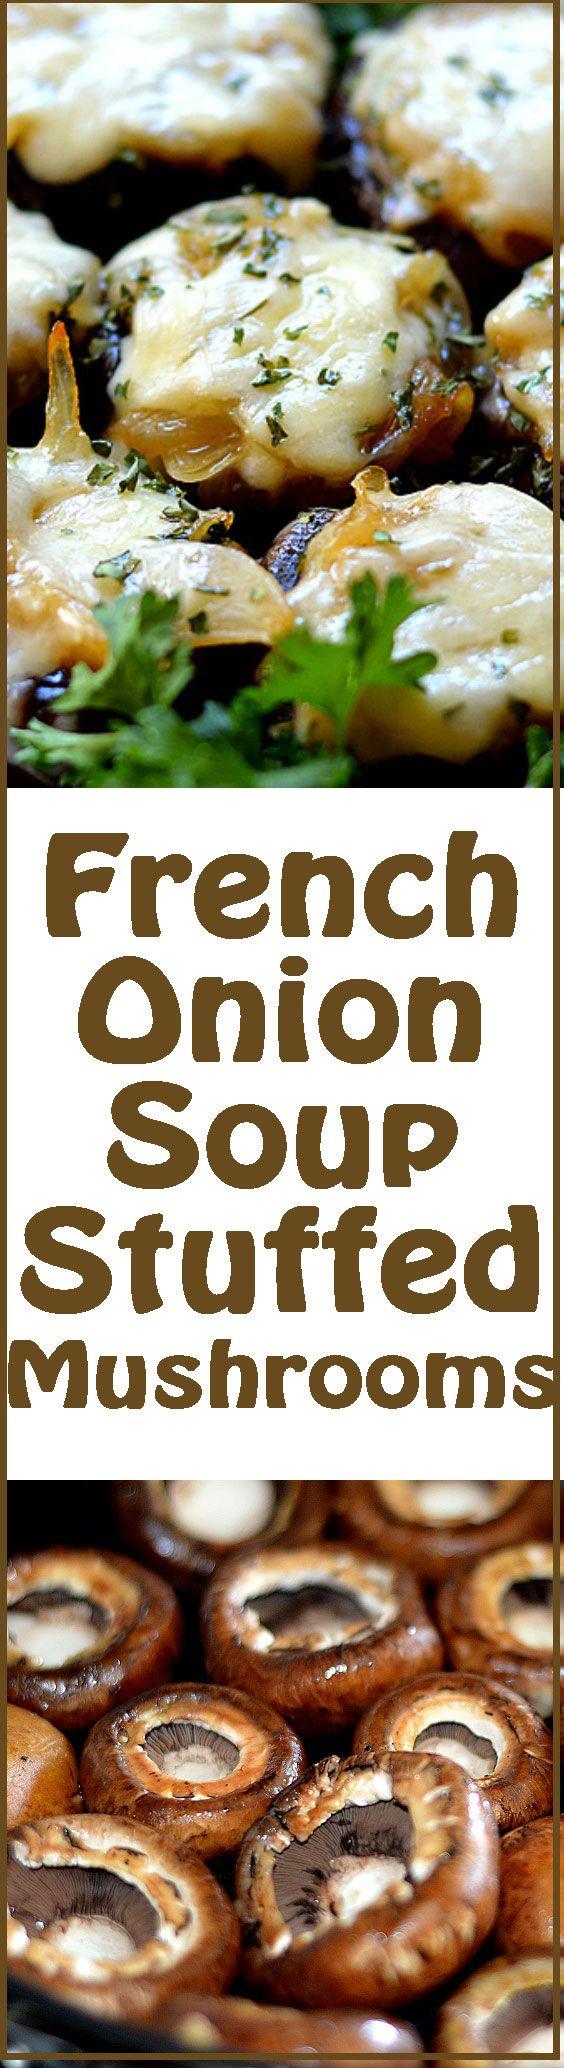 French Onion Soup Stuffed Mushrooms - sub vegan cheese